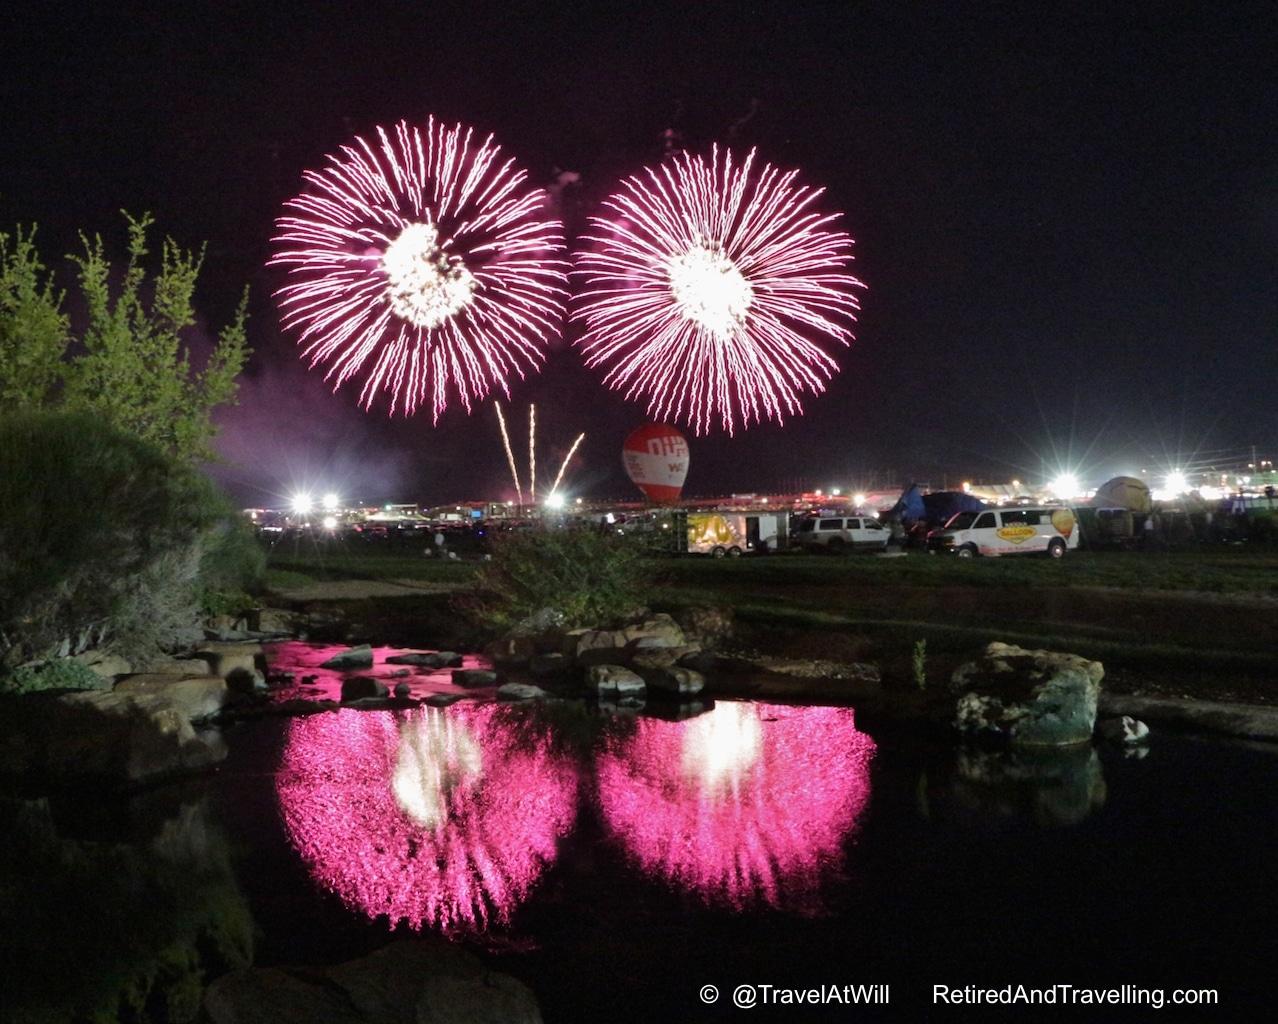 Balloon Fiesta Fireworks - Albuquerque In the Fall.jpg